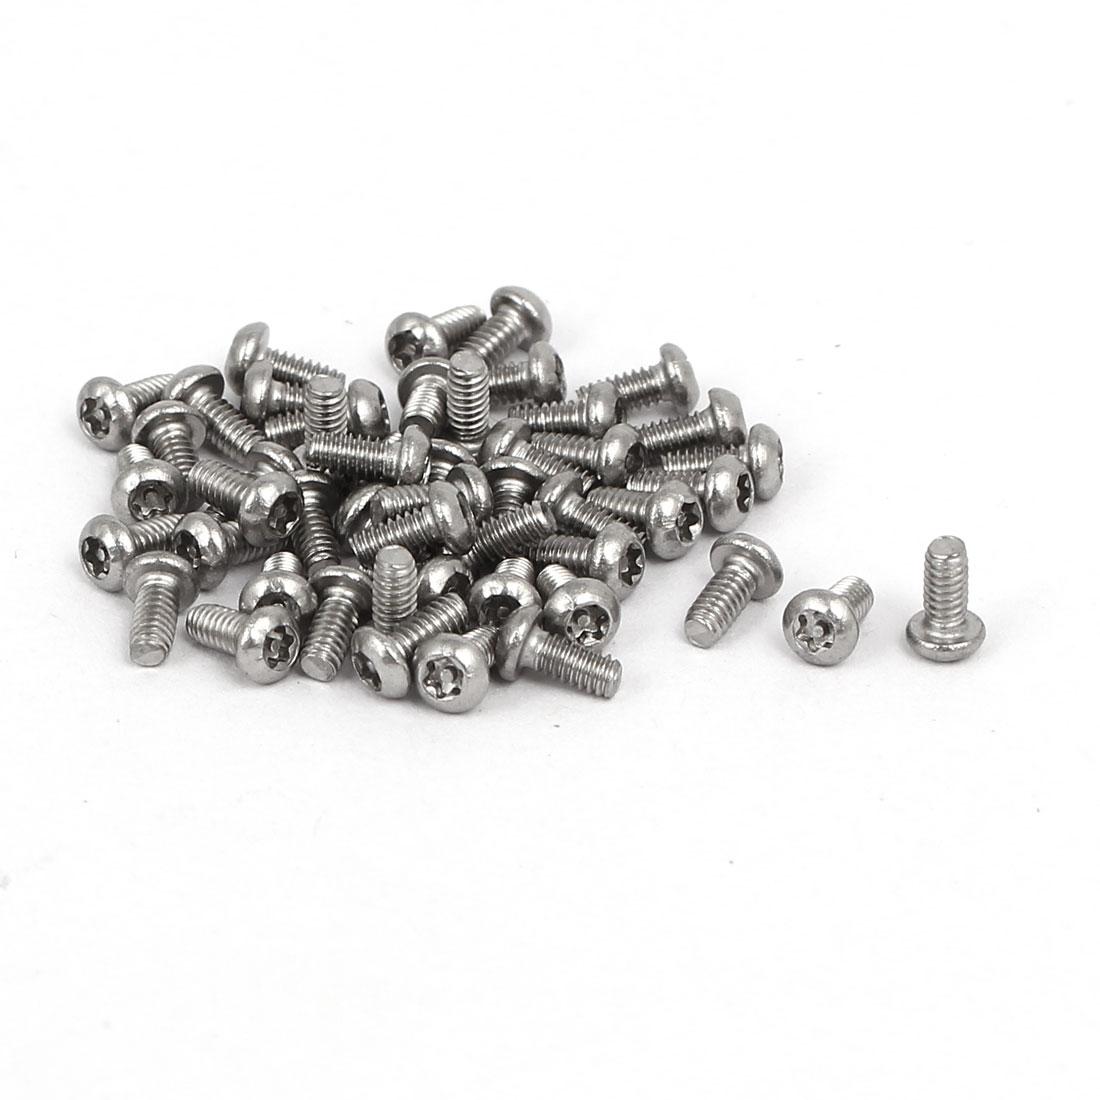 M2x4mm 304 Stainless Steel Button Head Torx Security Machine Screws 50pcs